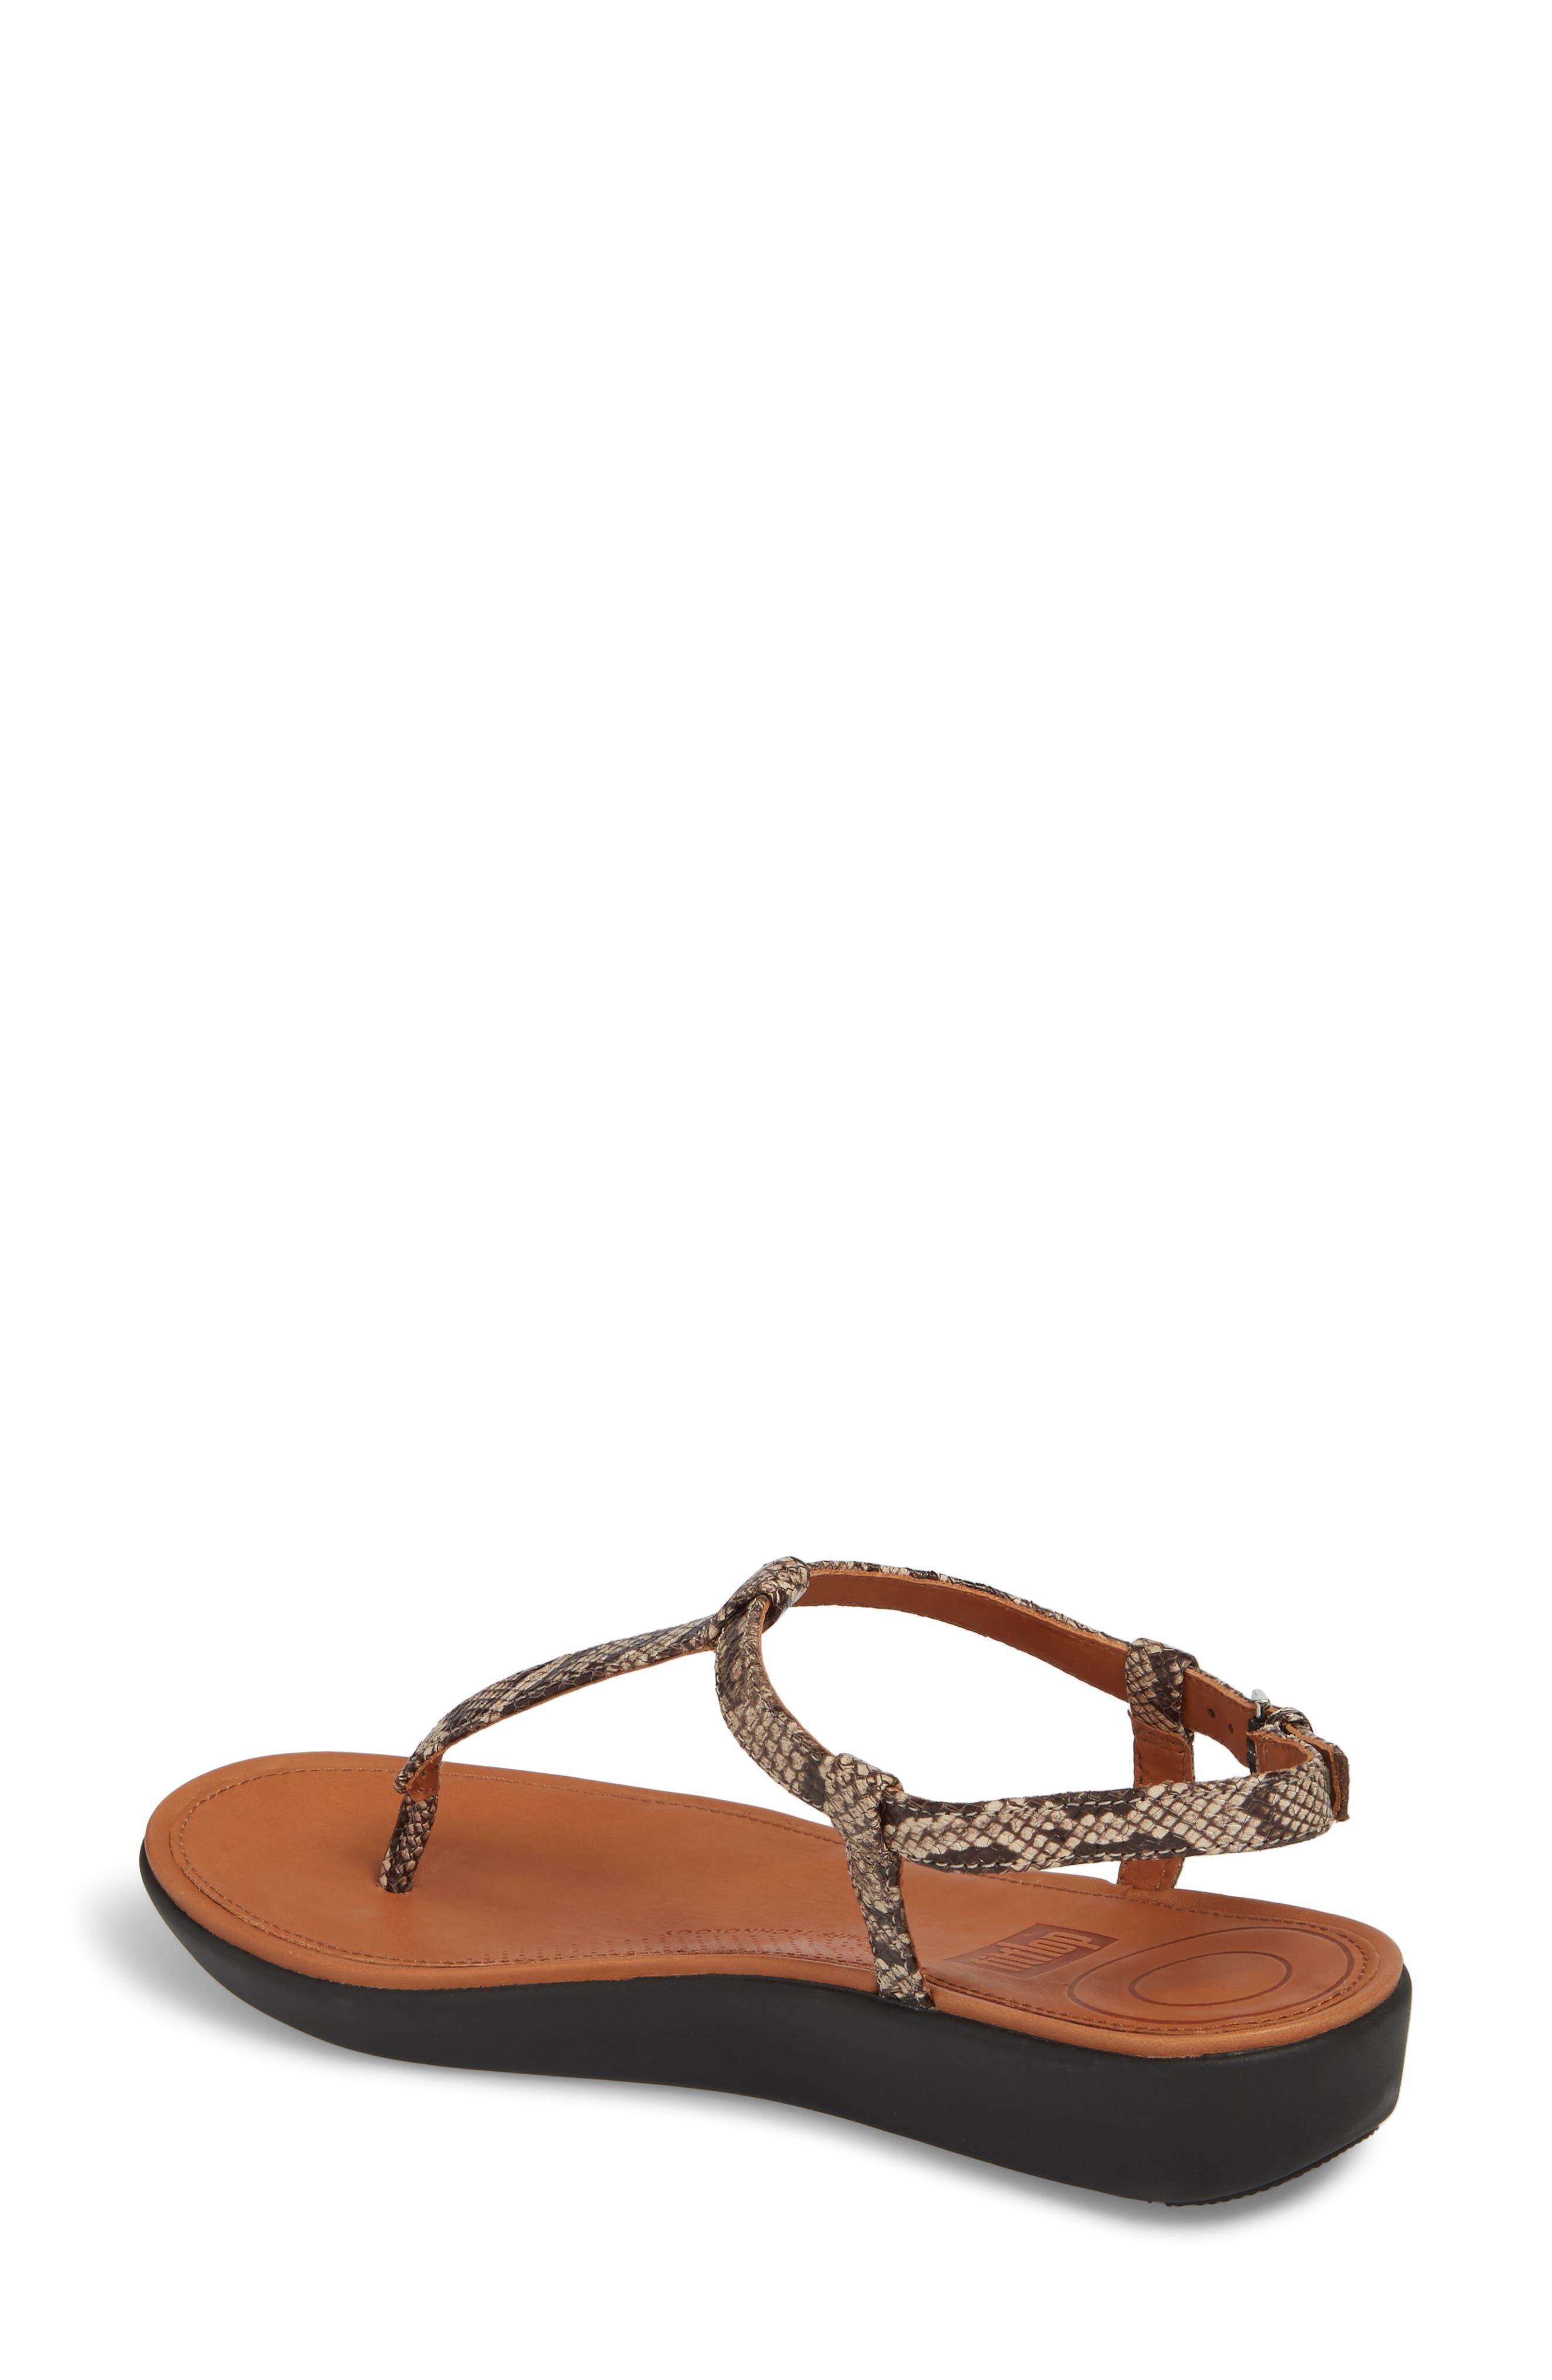 Tia Sandal,                             Alternate thumbnail 2, color,                             Taupe Snake Leather